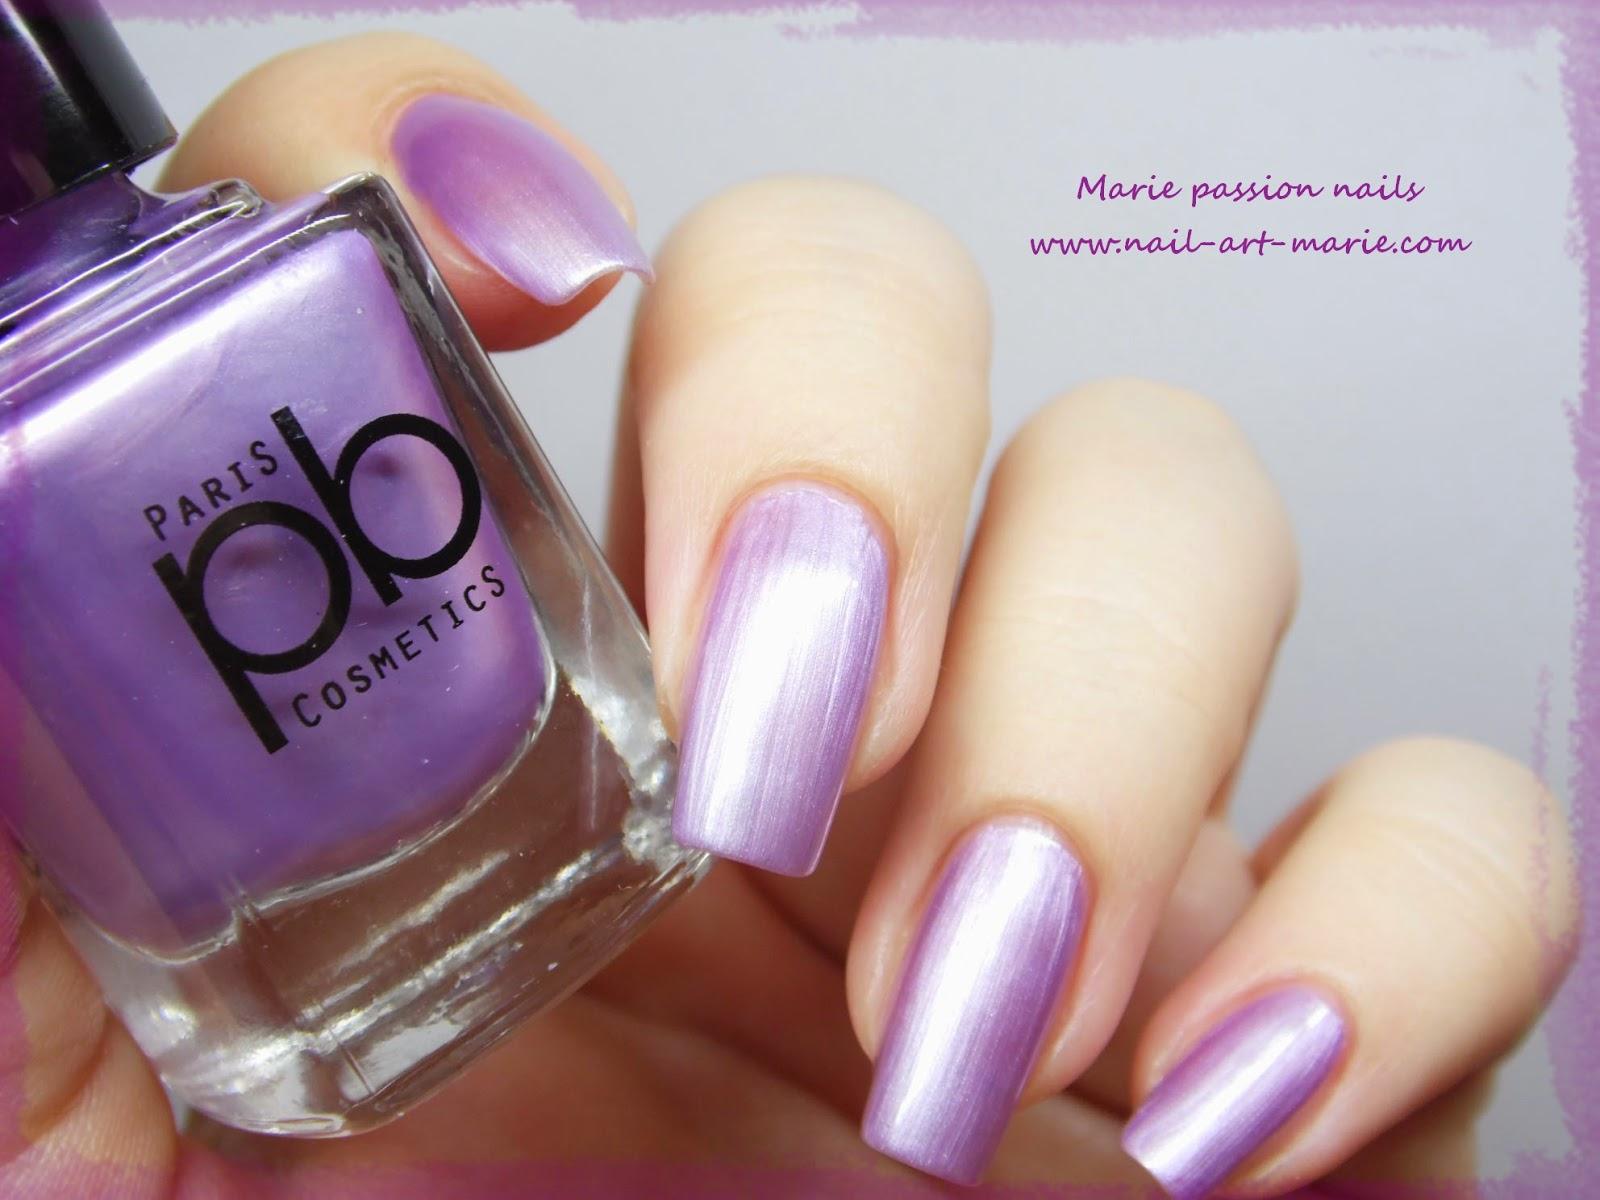 PB Cosmetics Violet Argent6